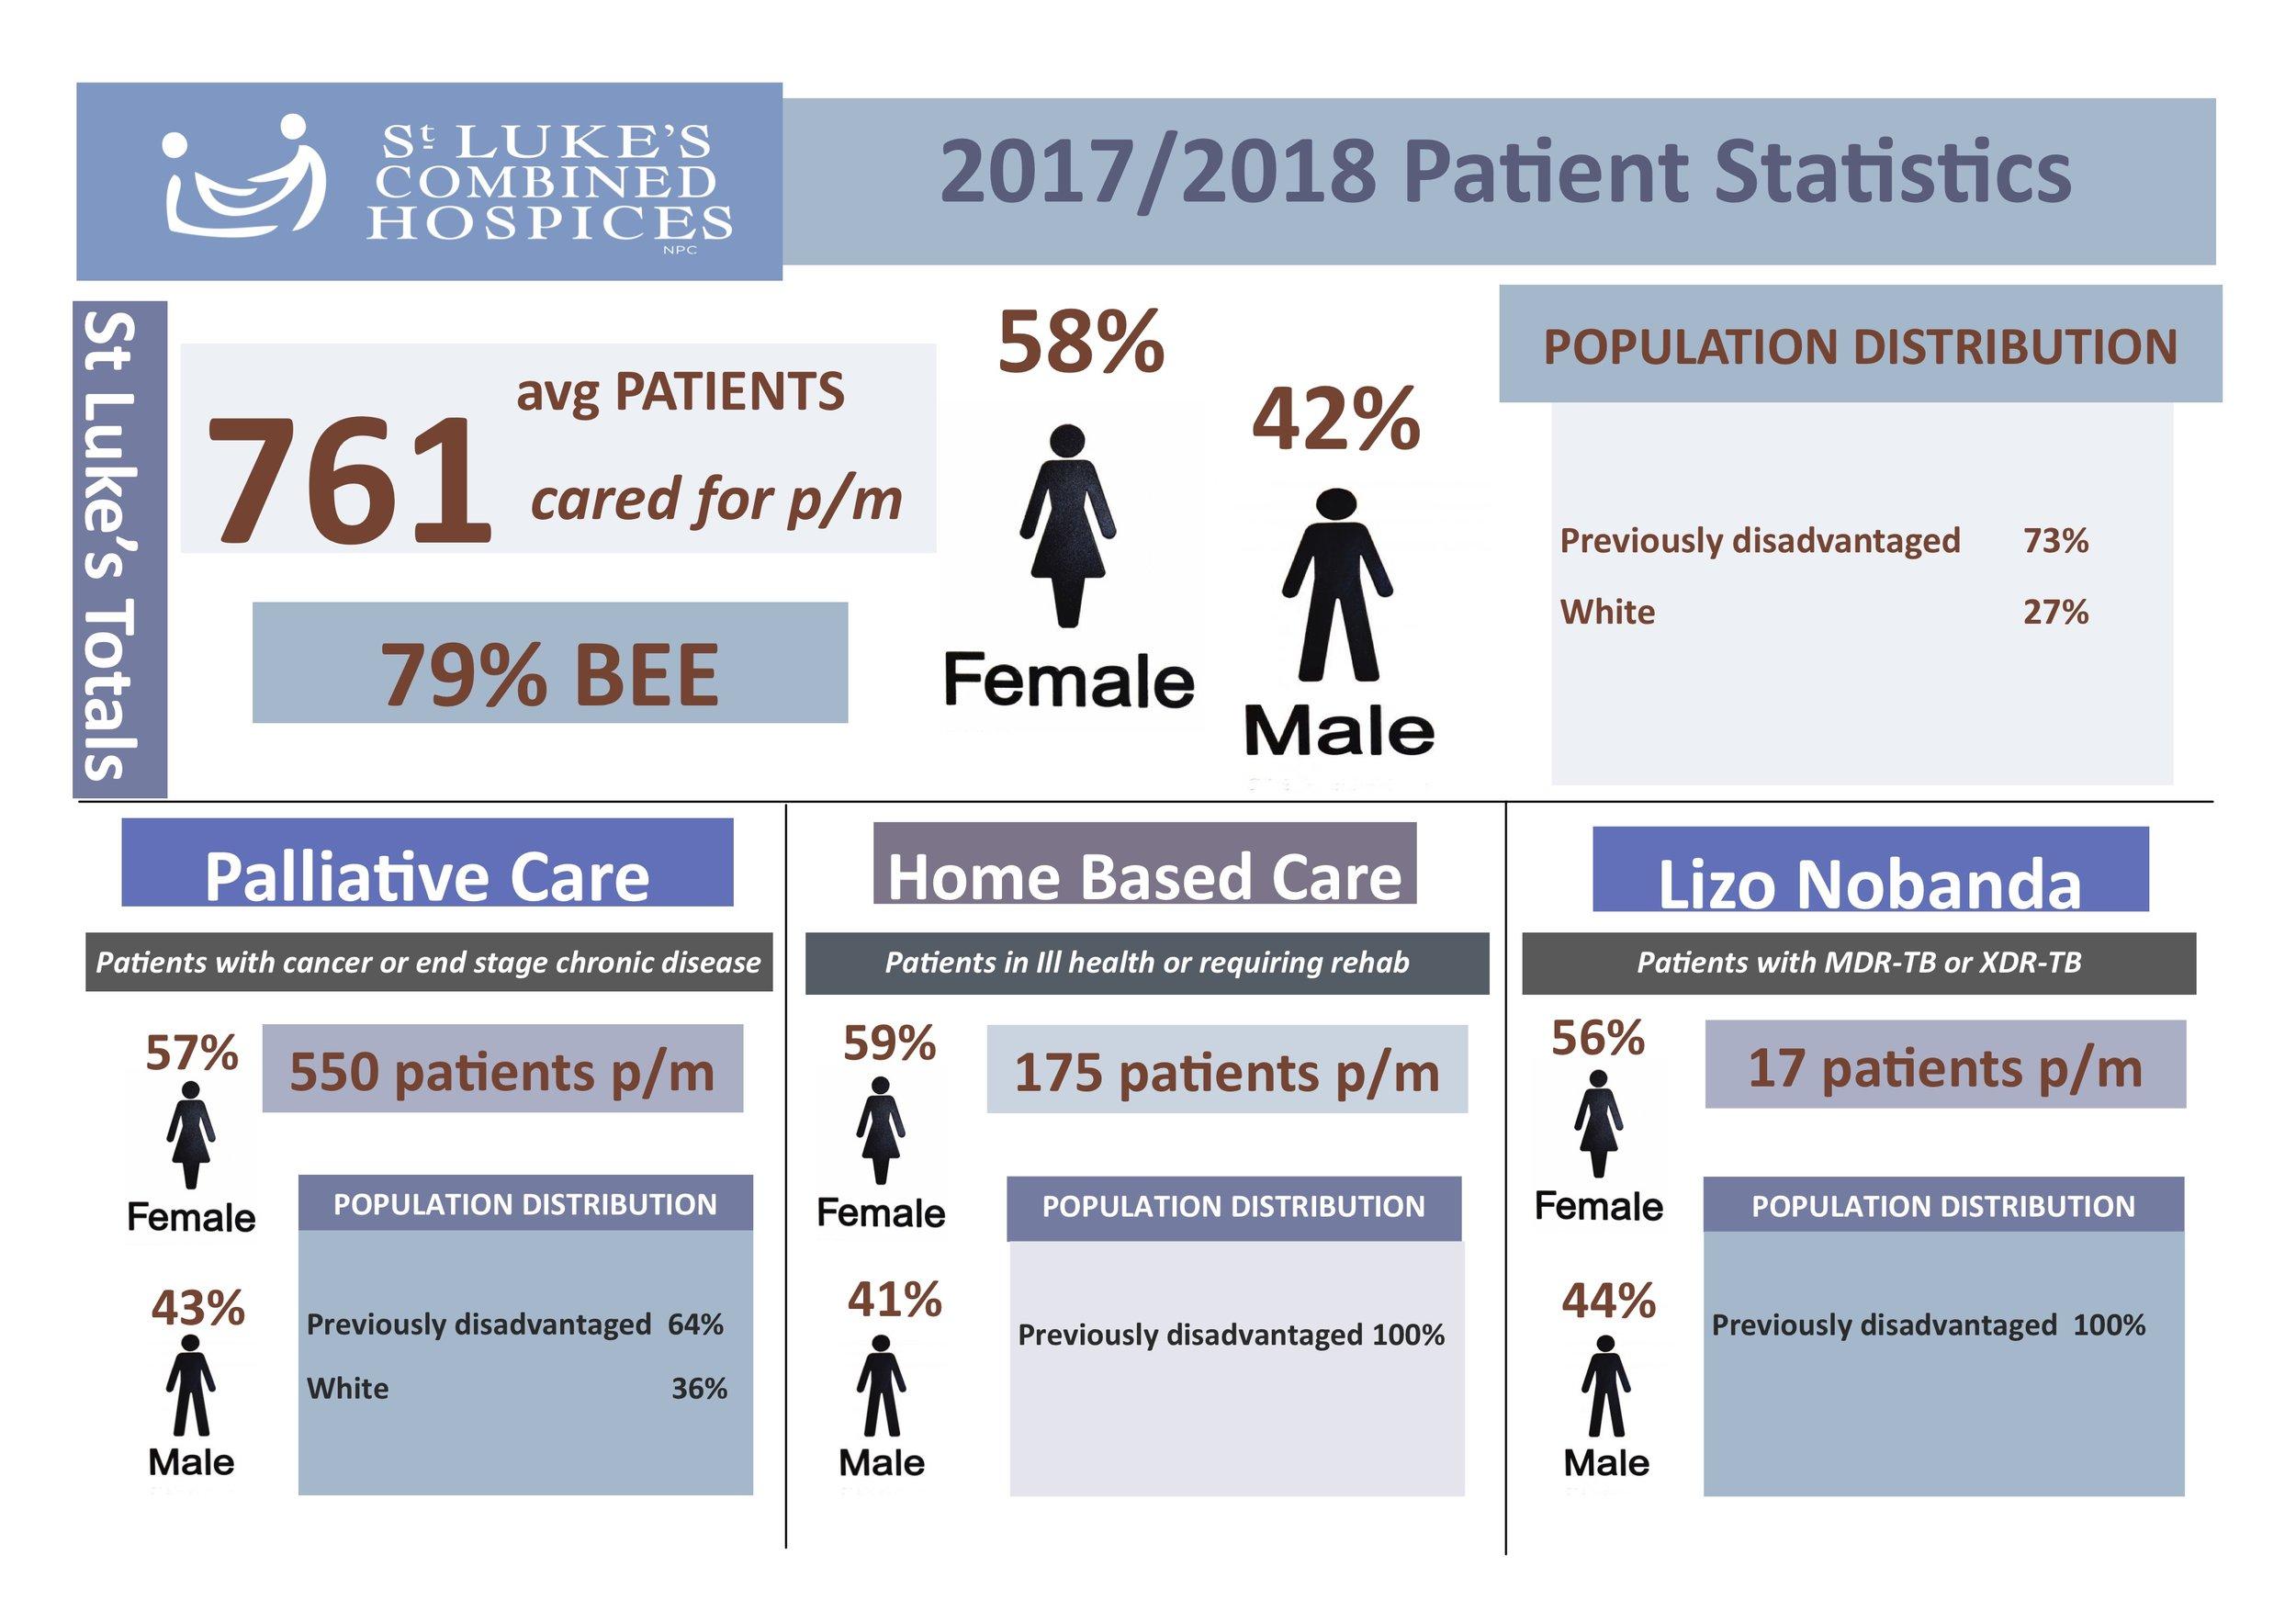 St Lukes 2017.18 Patient Stats.jpg